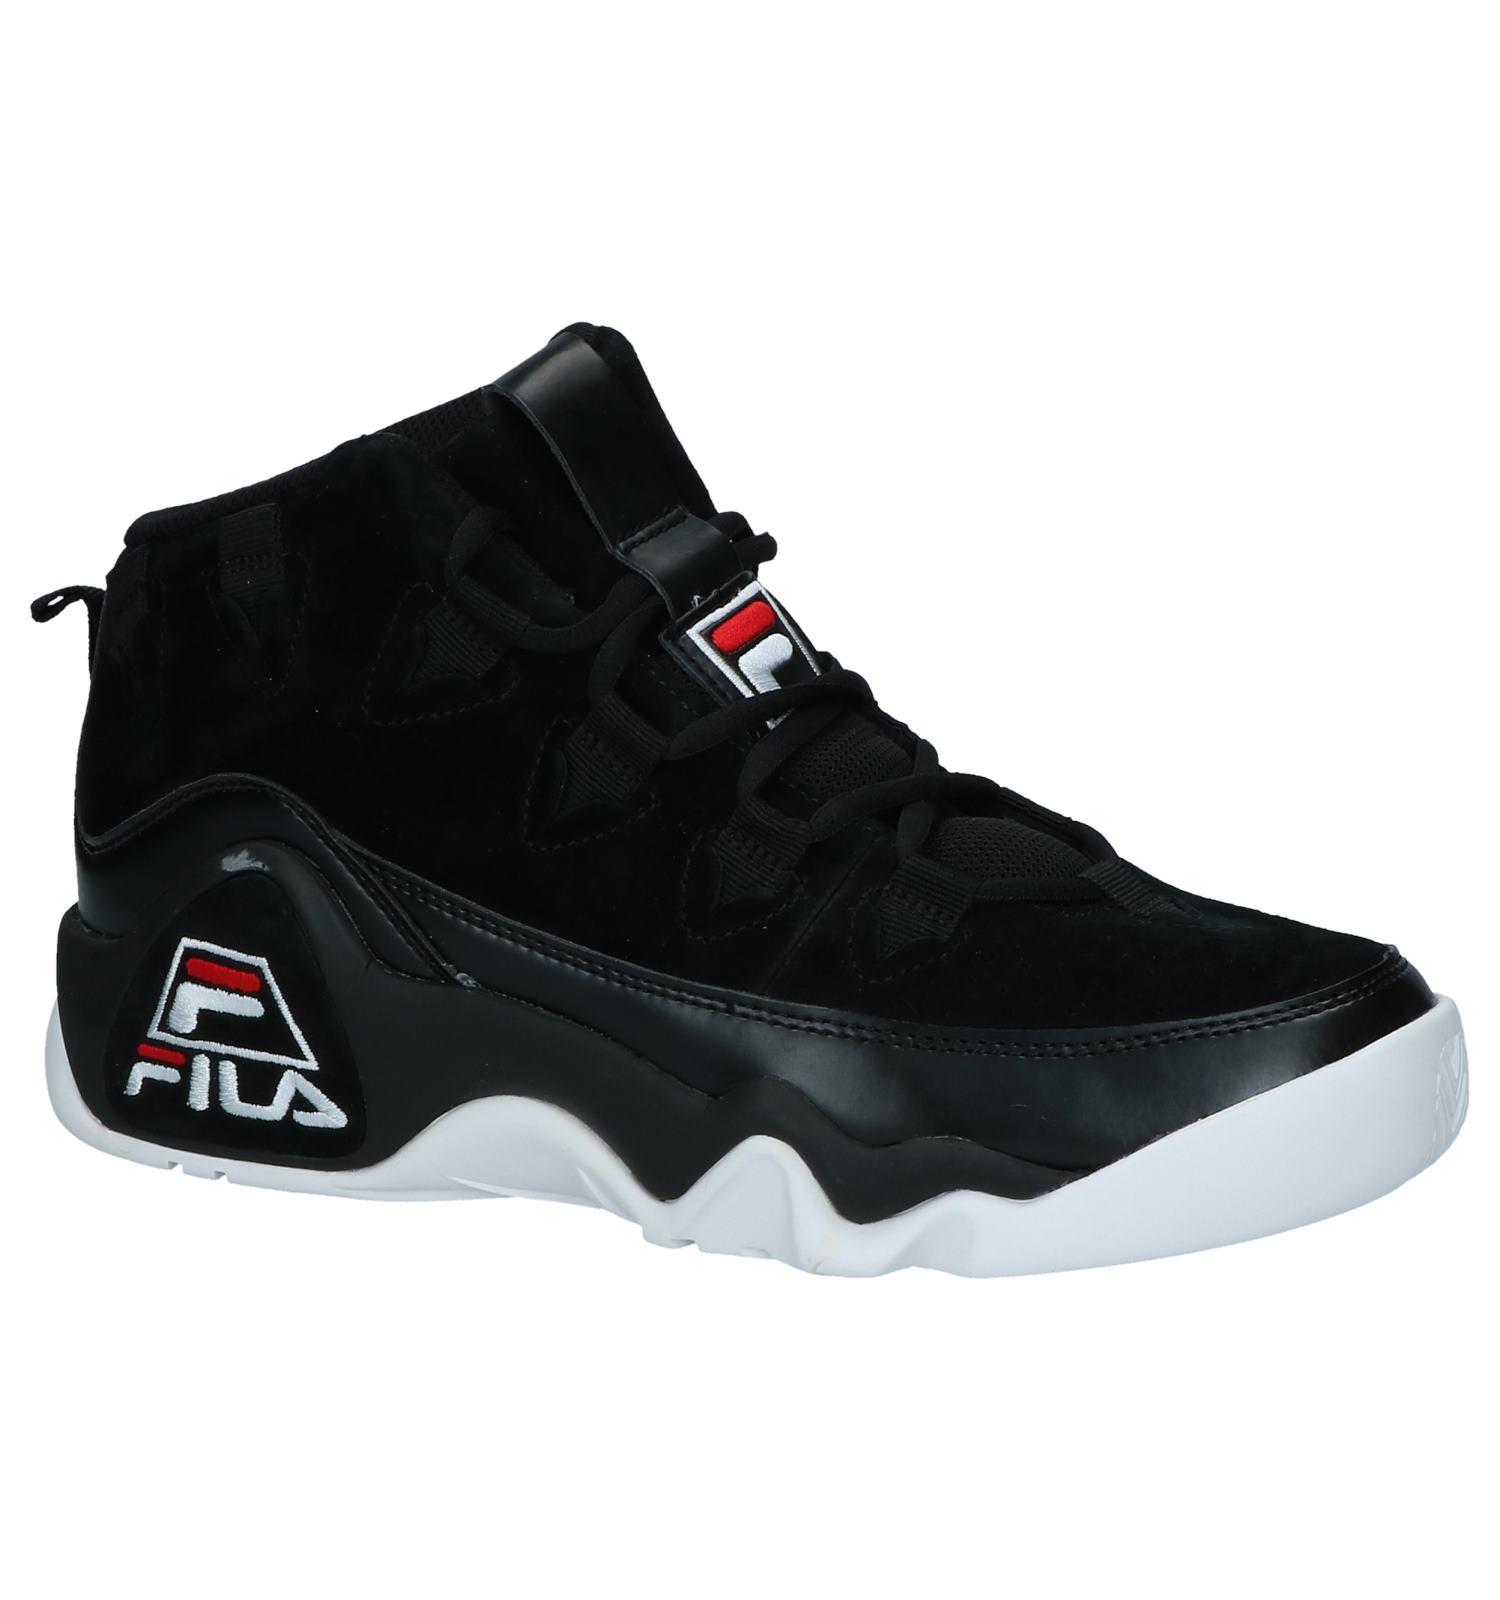 0818b0026a0 Fila Zwarte Hoge Sneakers   TORFS.BE   Gratis verzend en retour